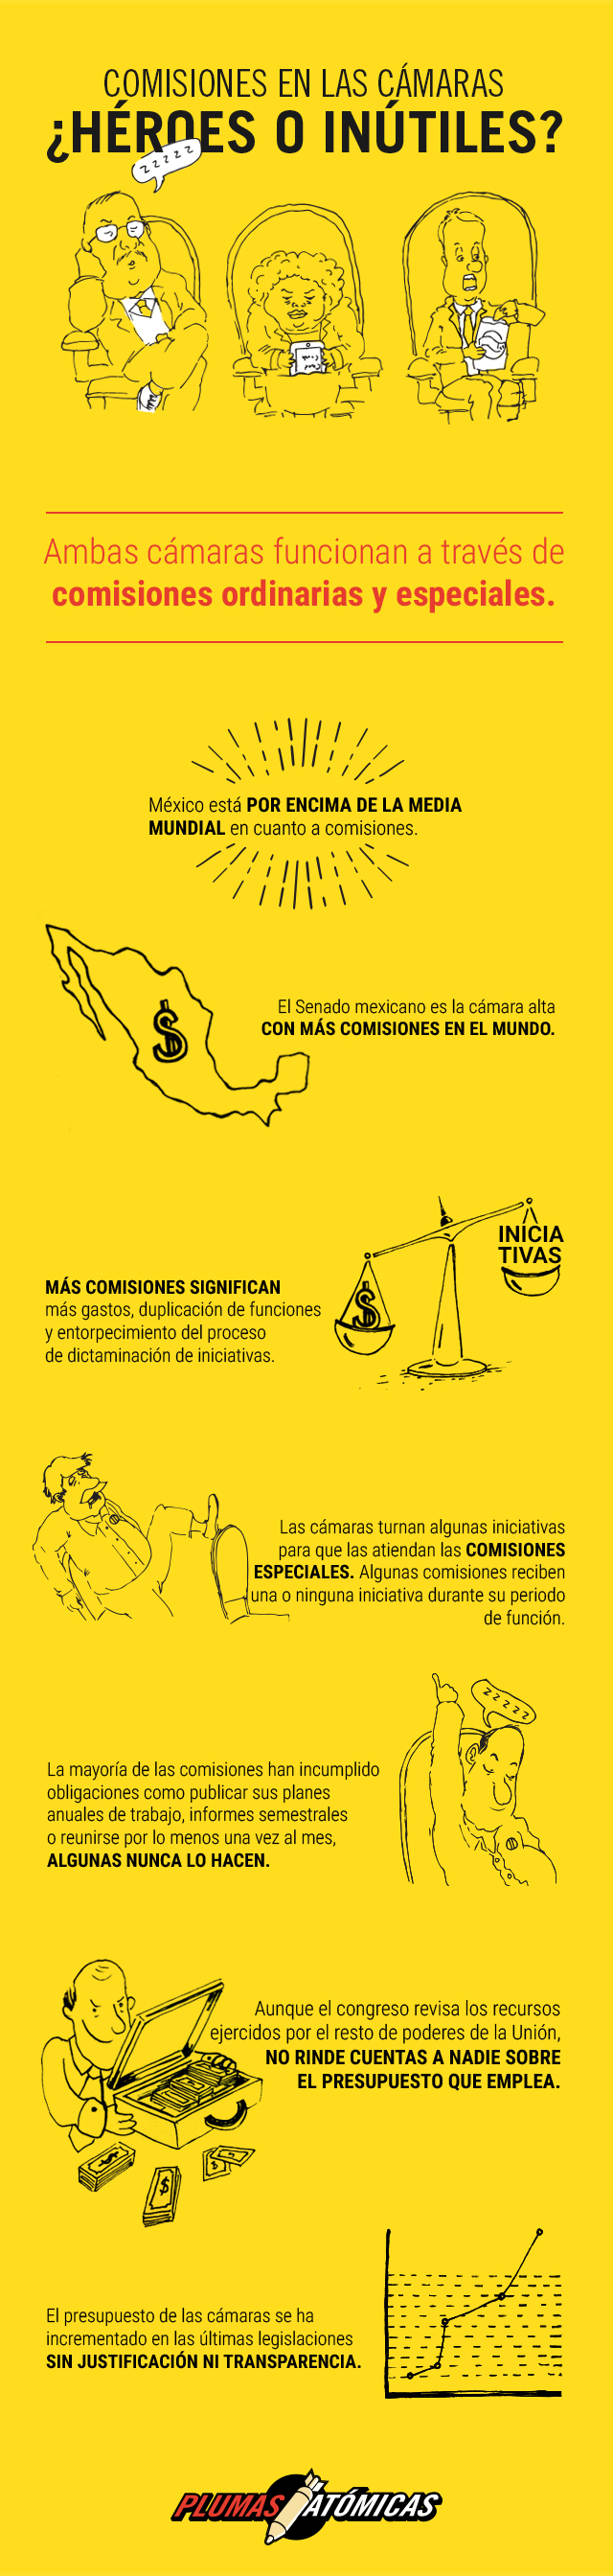 infografia comisiones